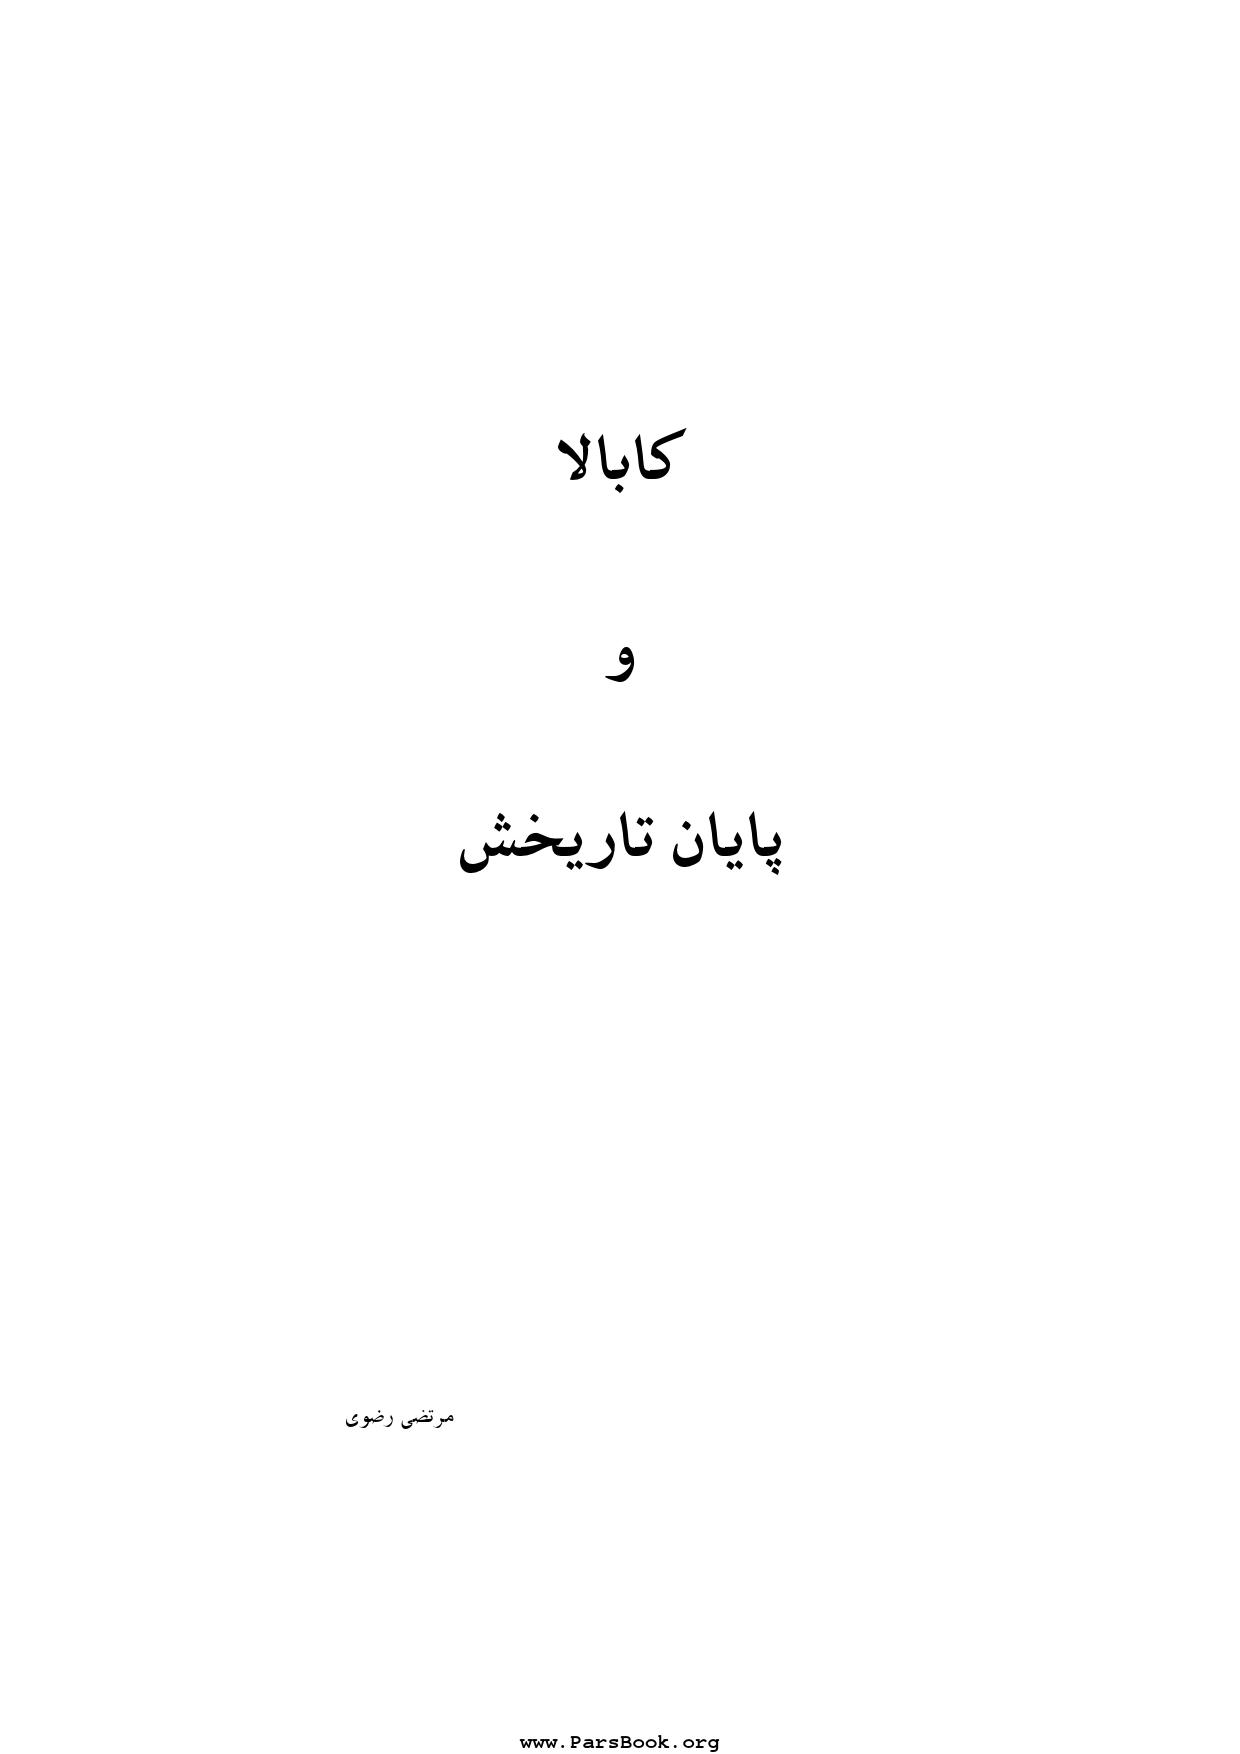 kabala-va-payanash_000001